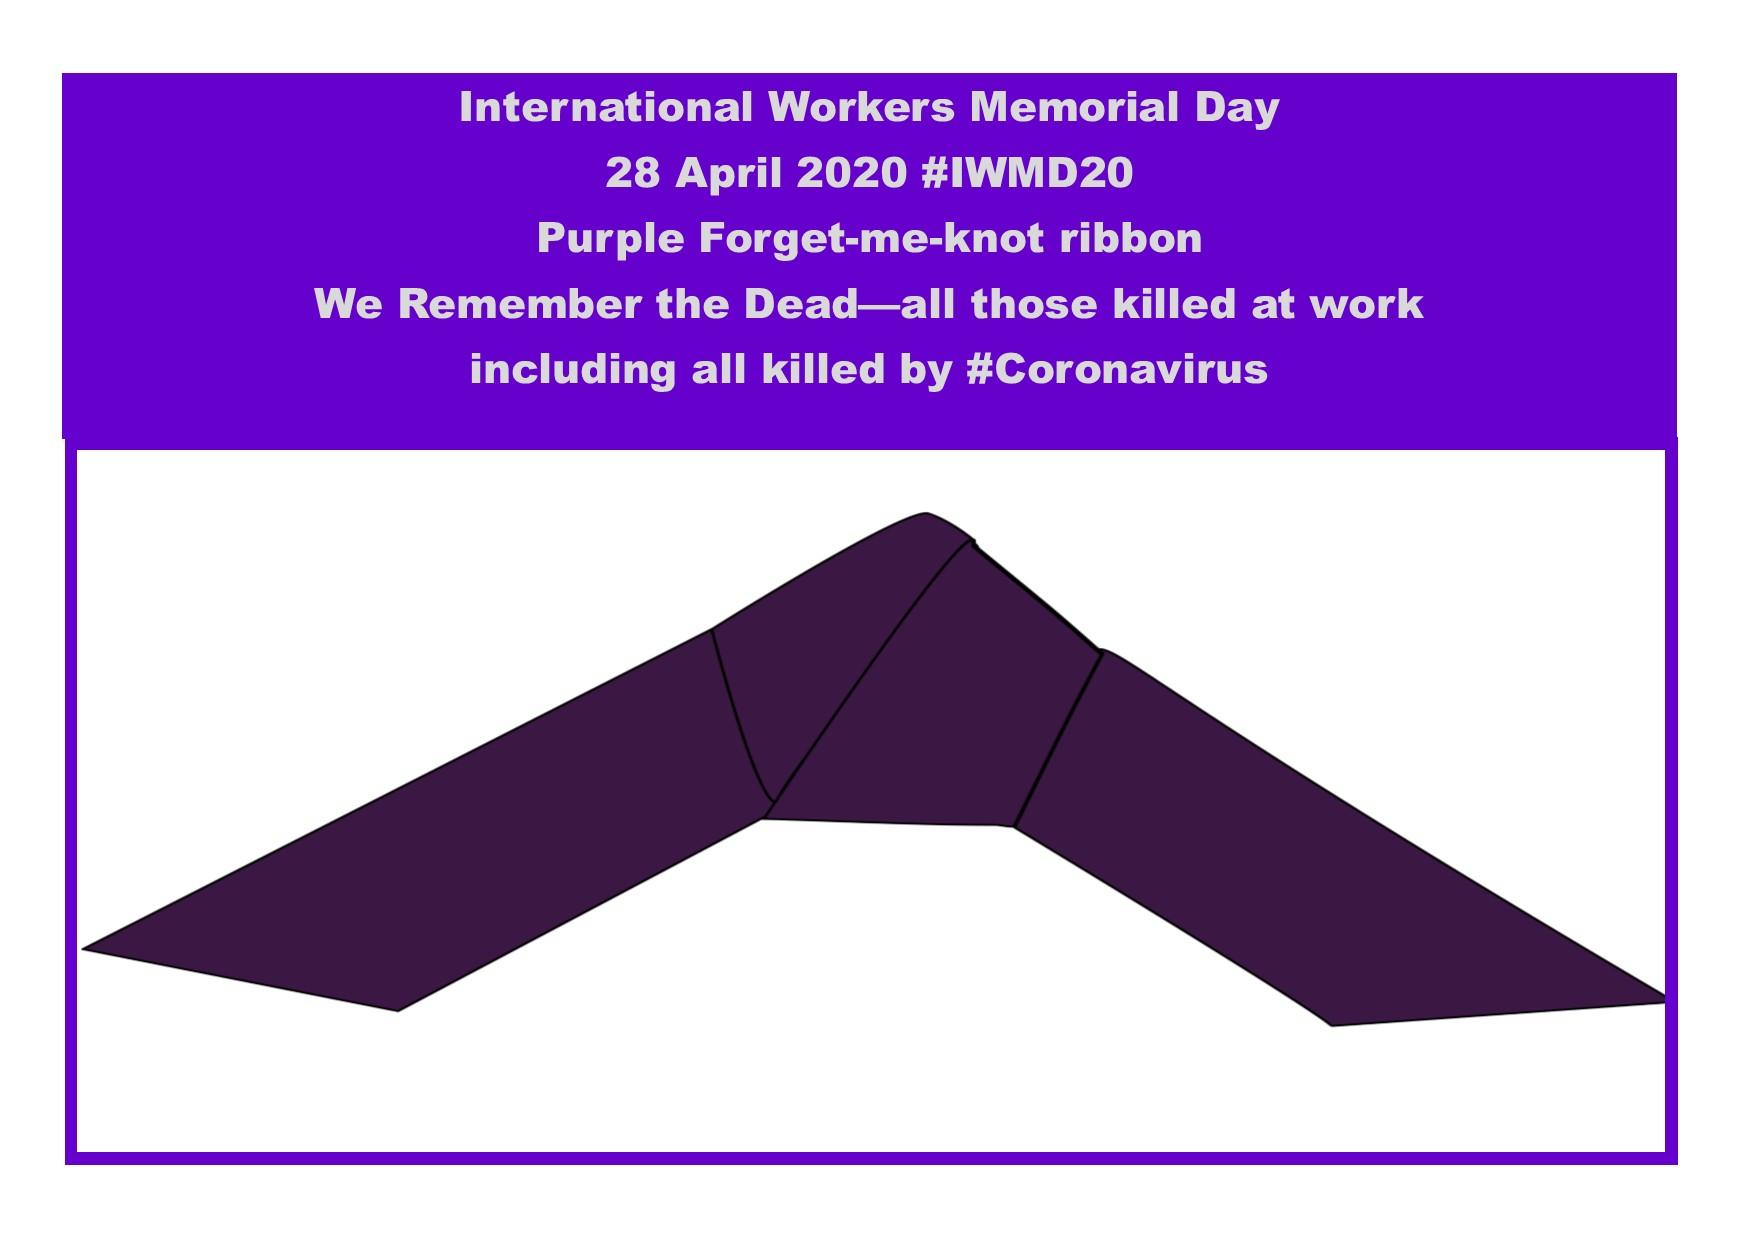 Workers Memorial Day Hazards Campaign